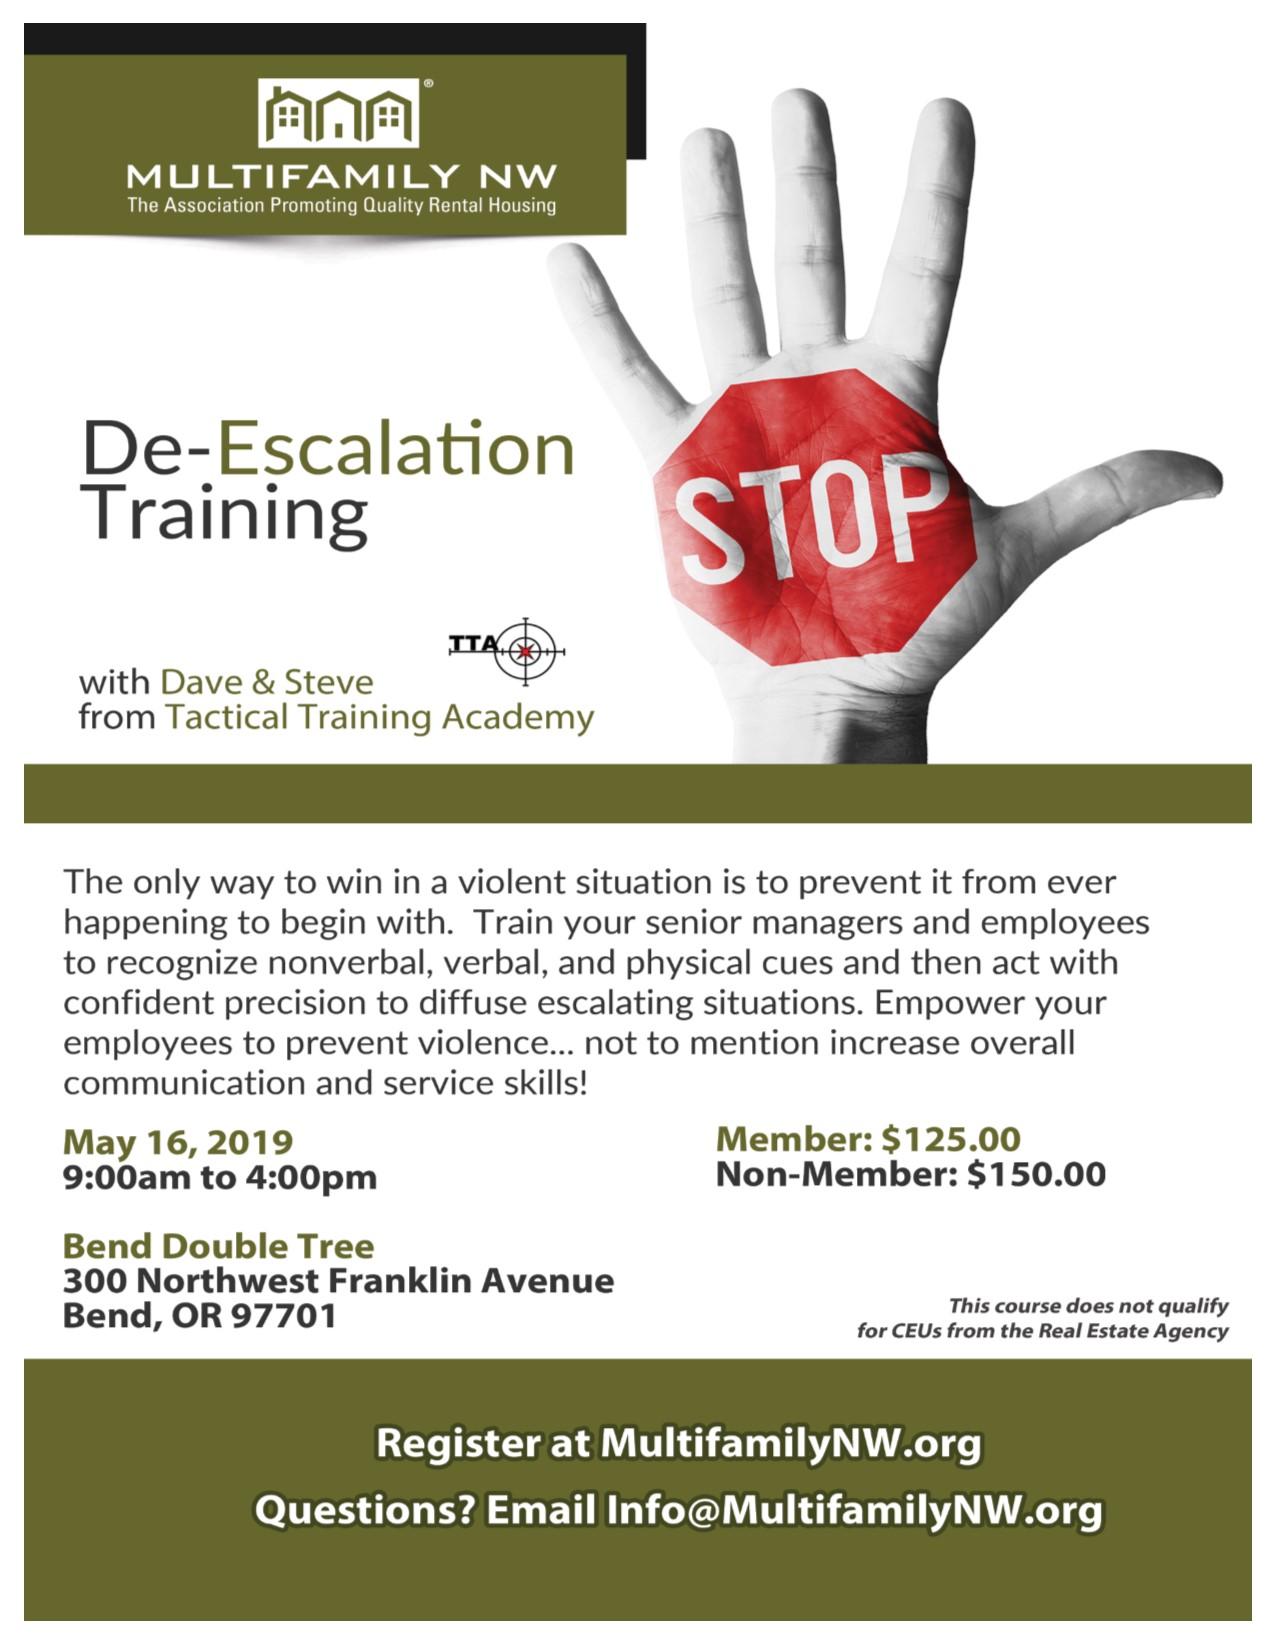 De-Escalation Training - Bend - Multifamily NW